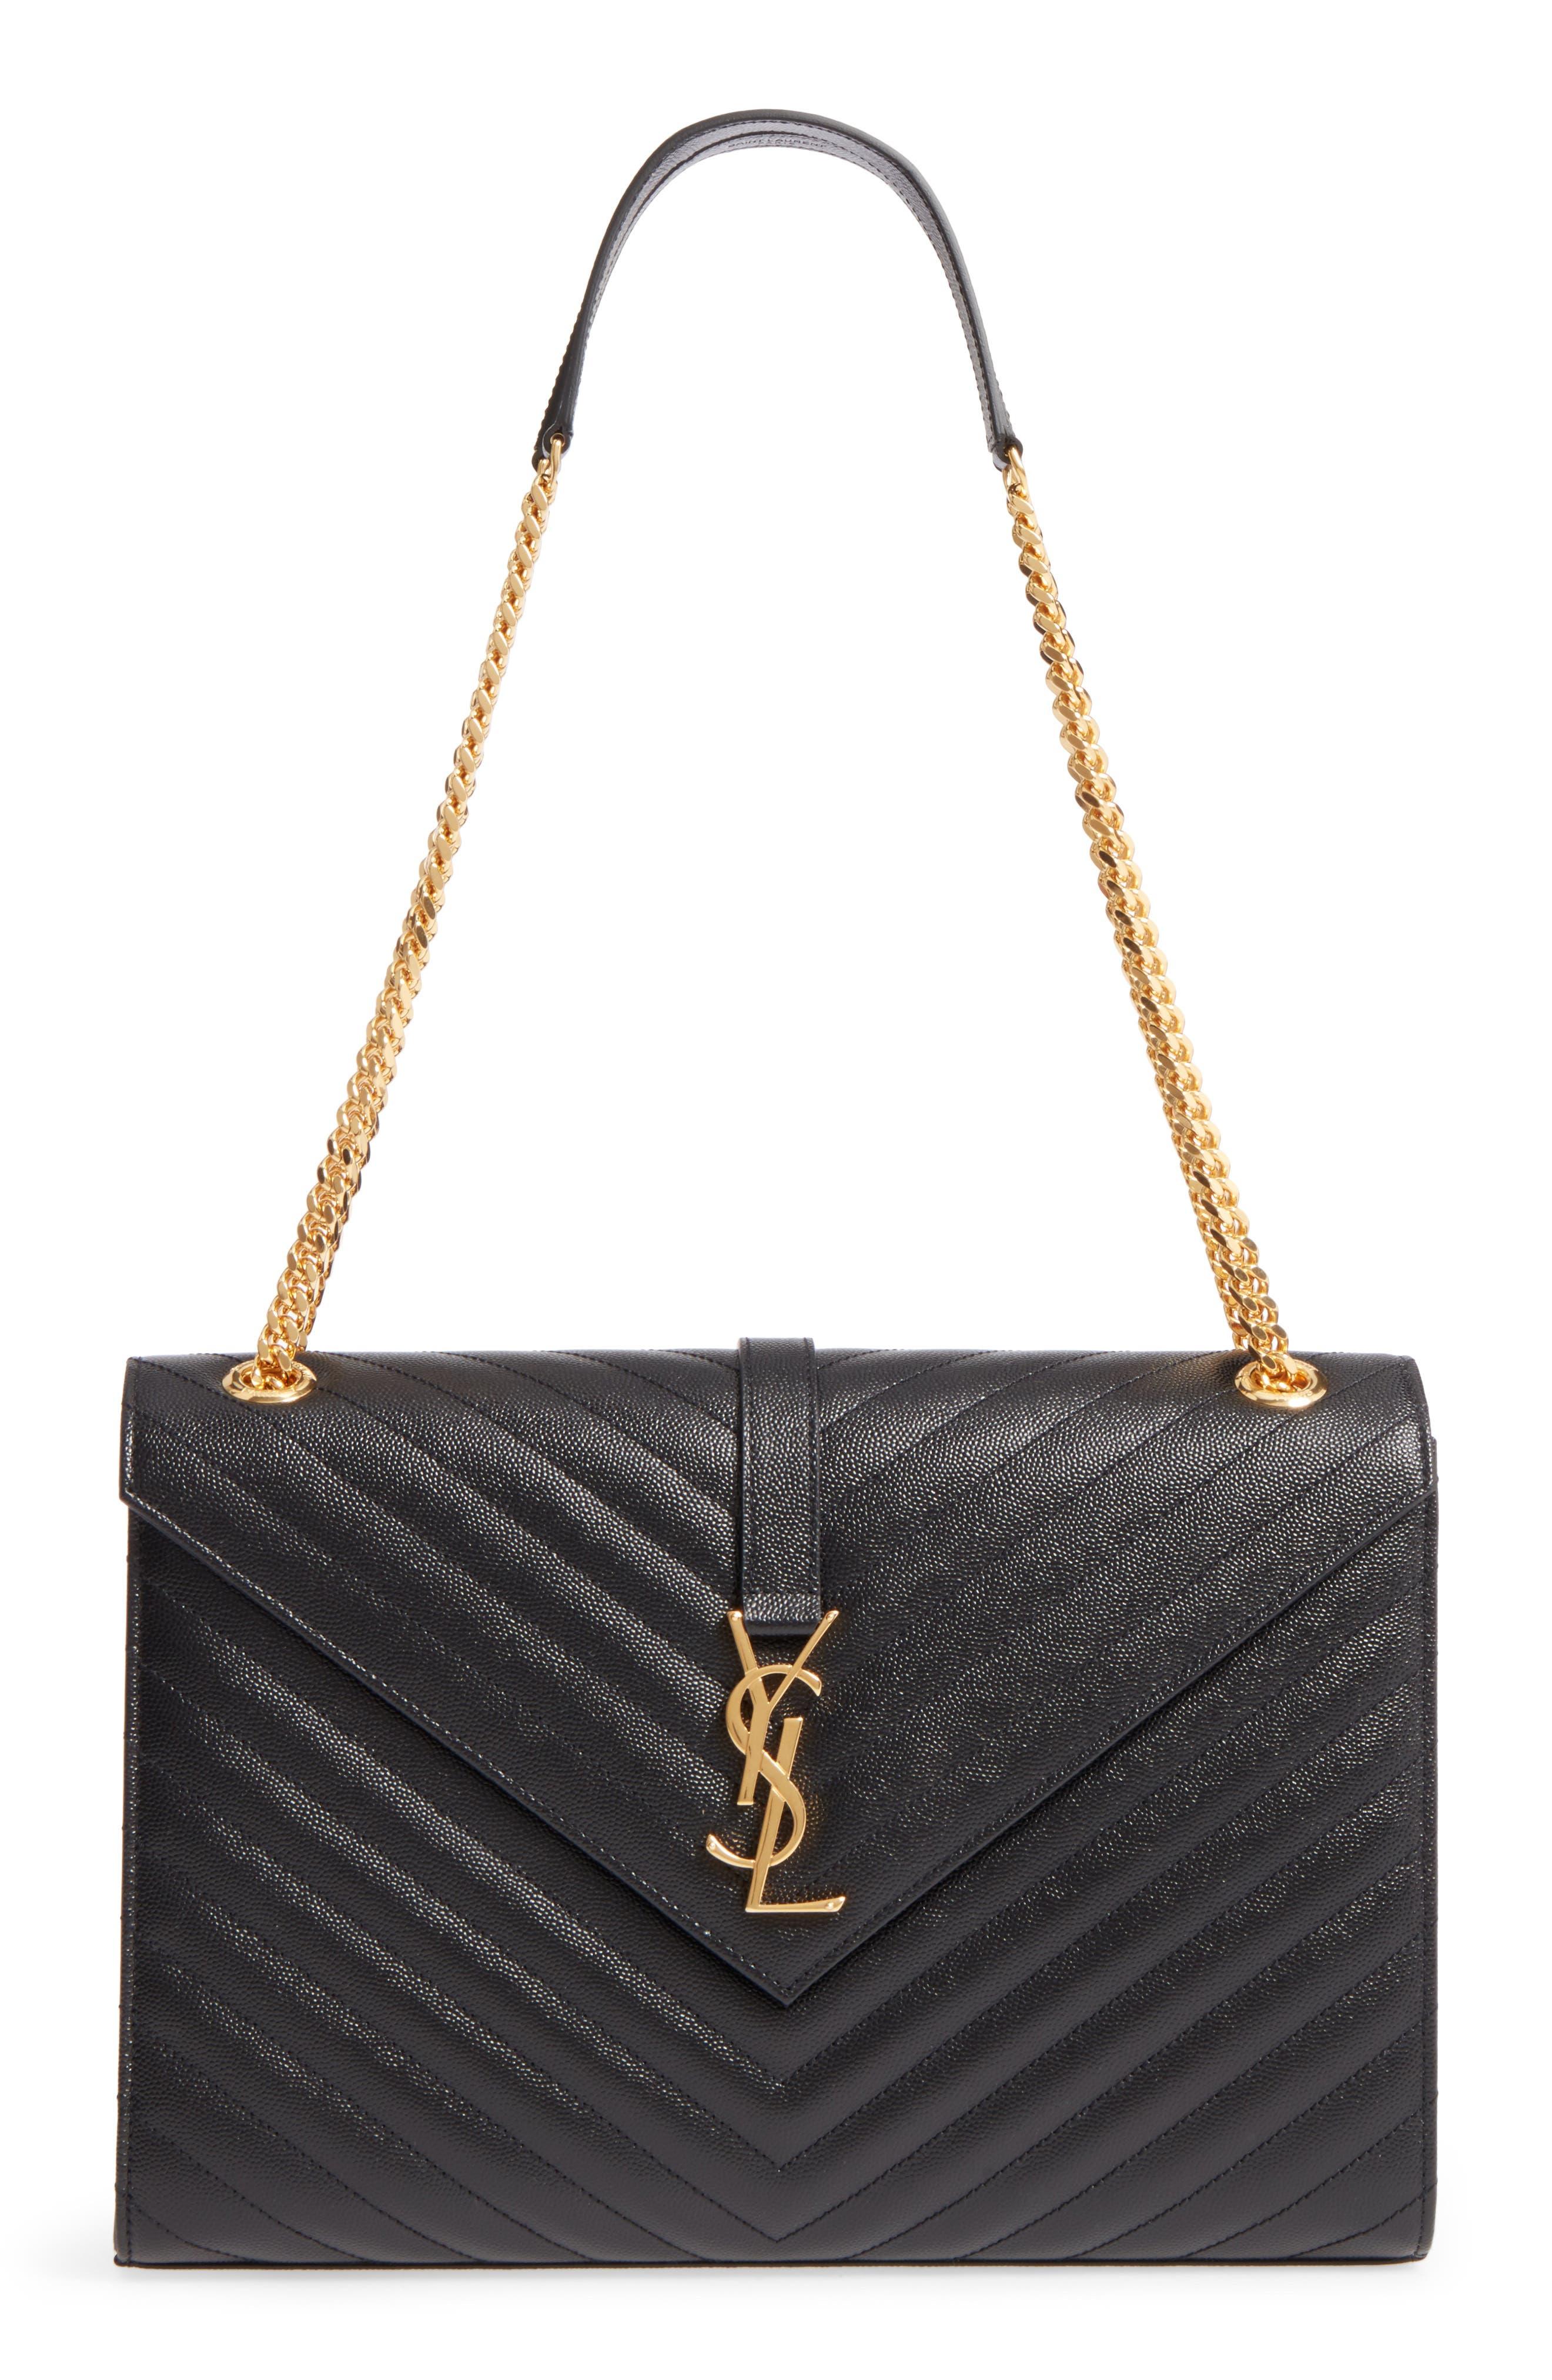 Alternate Image 1 Selected - Saint Laurent Medium Grained Matelassé Quilted Leather Shoulder Bag